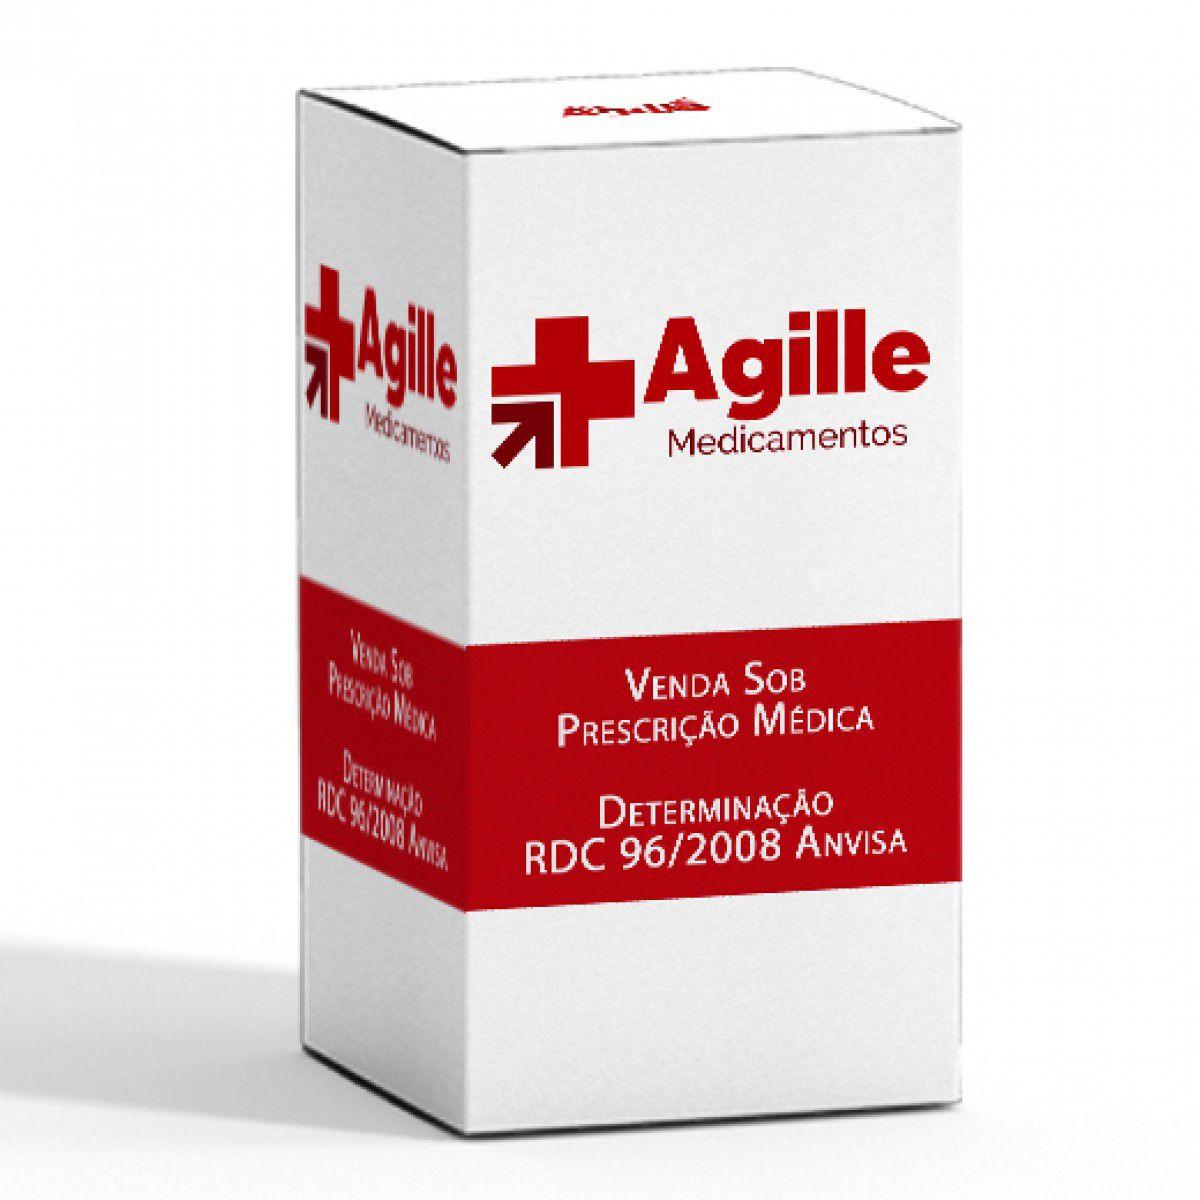 MICOFENOLATO DE MOFETILA 500 MG C/ 50 CPR (G)  - Agille Speciality